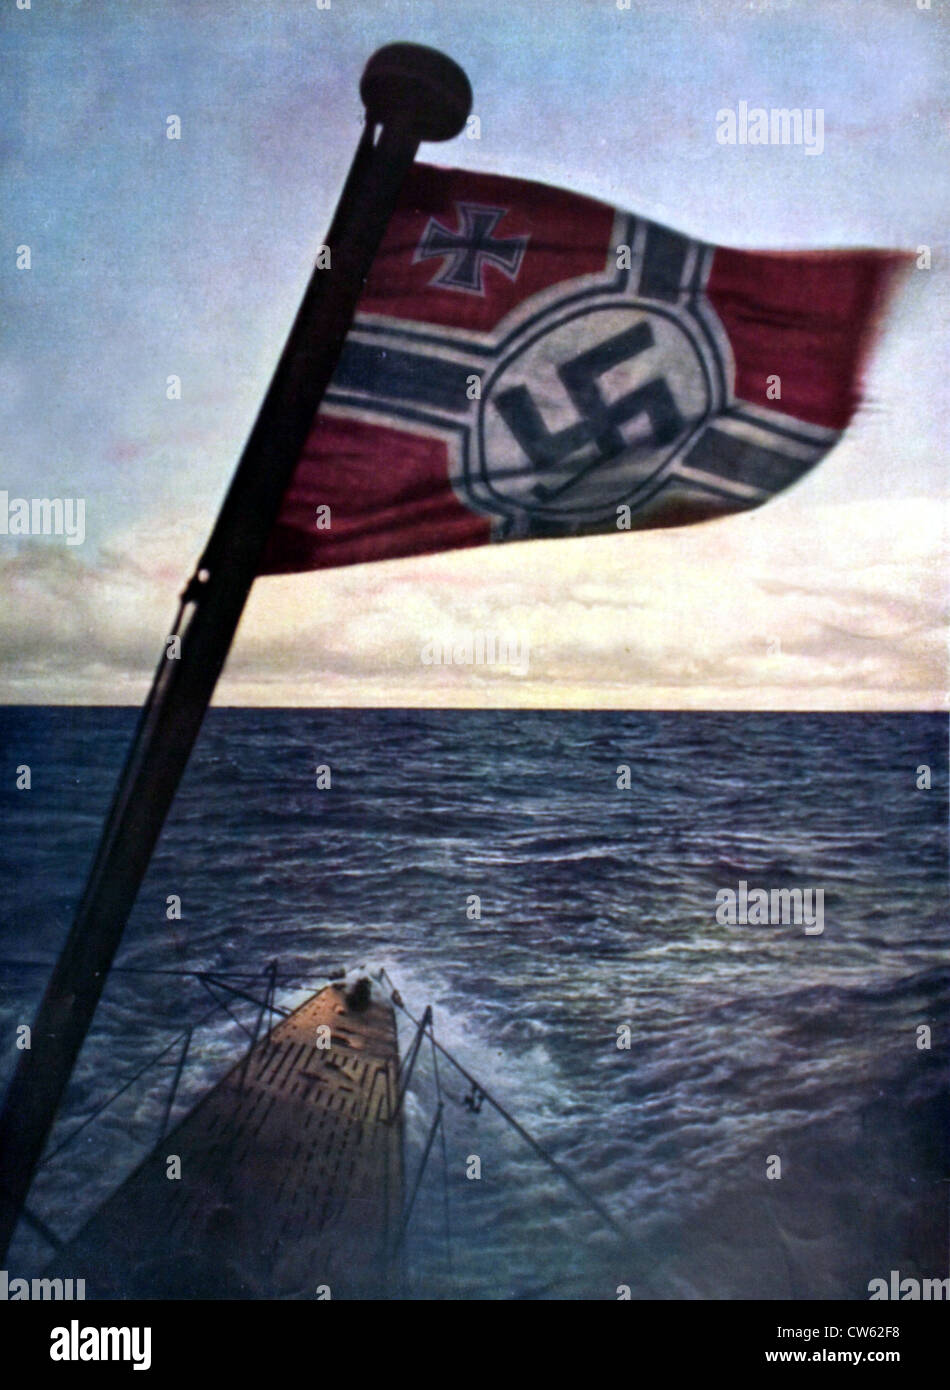 World War II.  A German submarine in the Atlantic Ocean, in 'Signal' Febrary 1941. - Stock Image